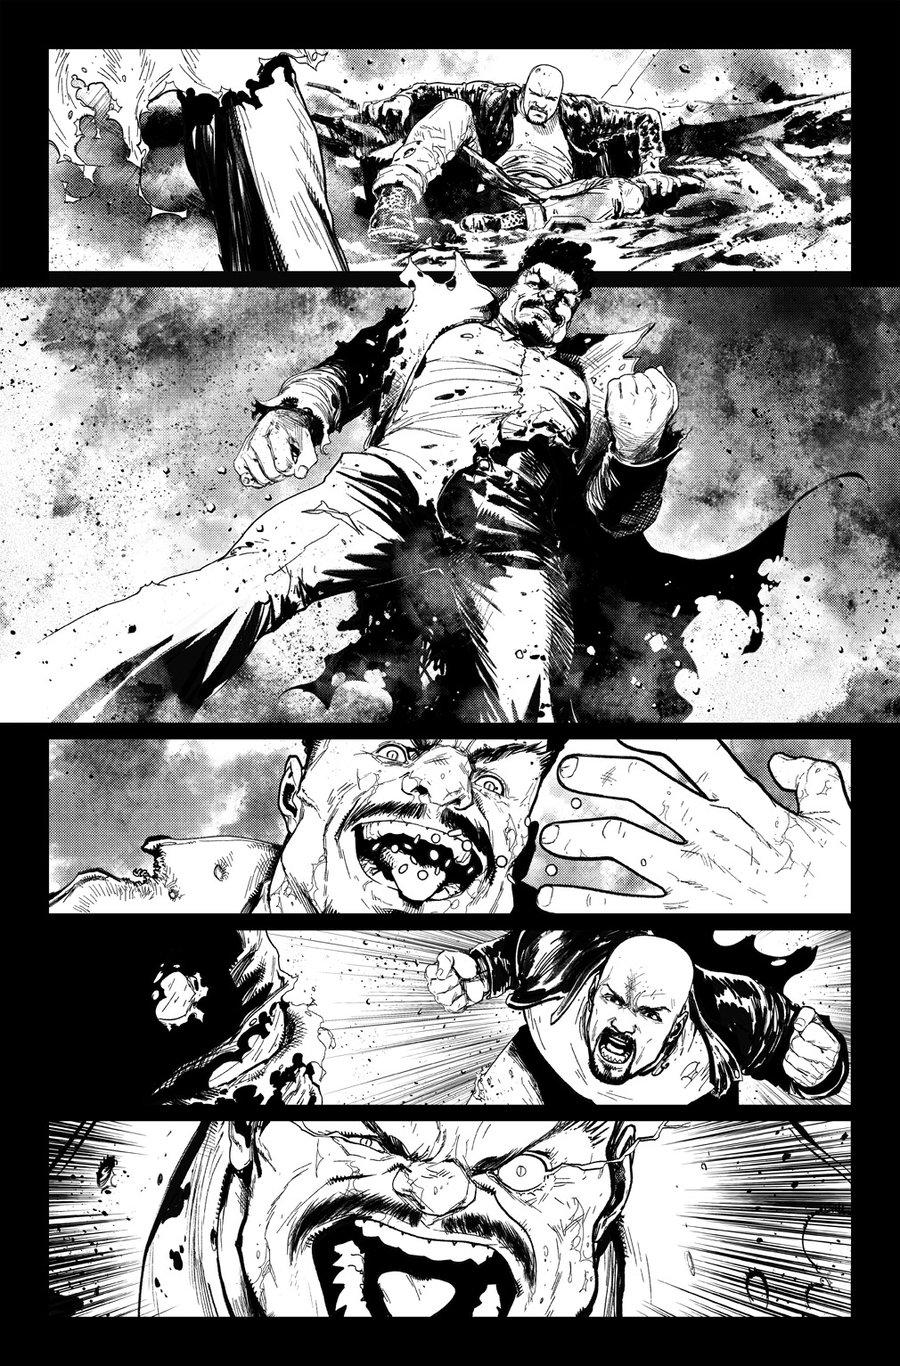 Image of DEFENDERS #9, p.16 ARTIST'S PROOF